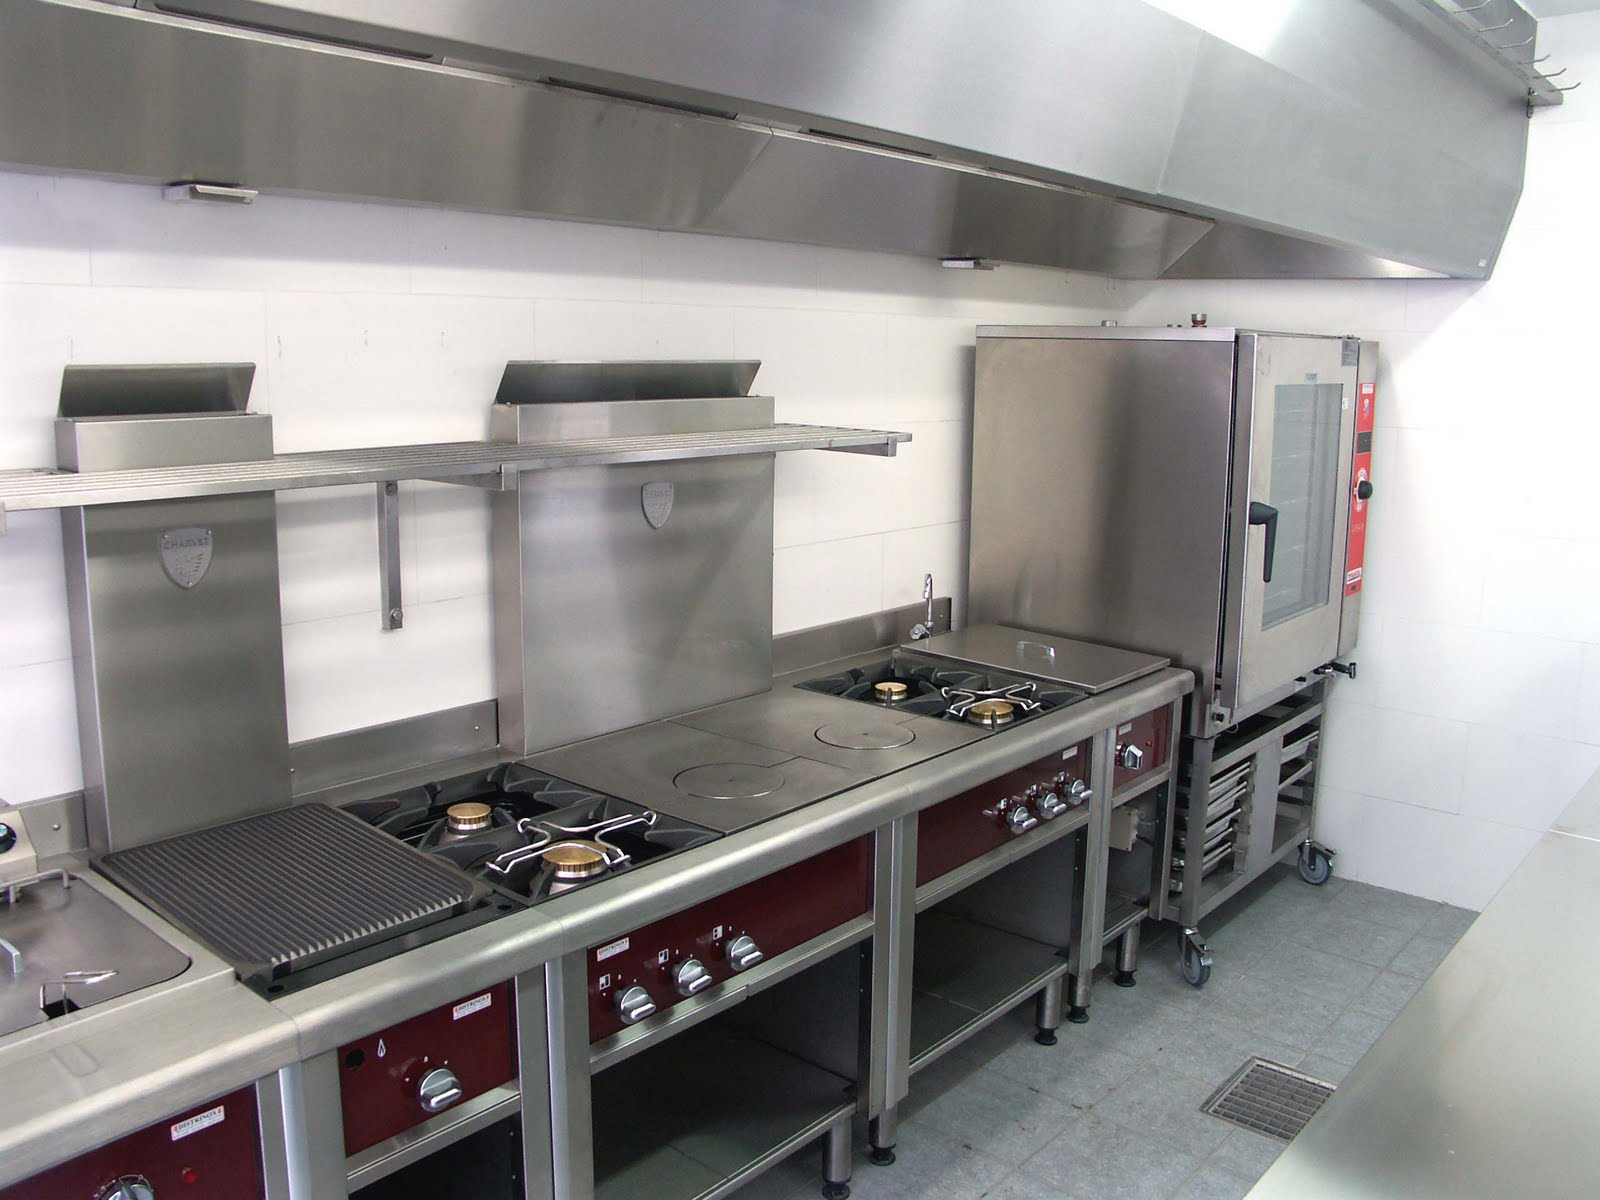 Cucine industriali milano: cucine industriali e per comunit ...